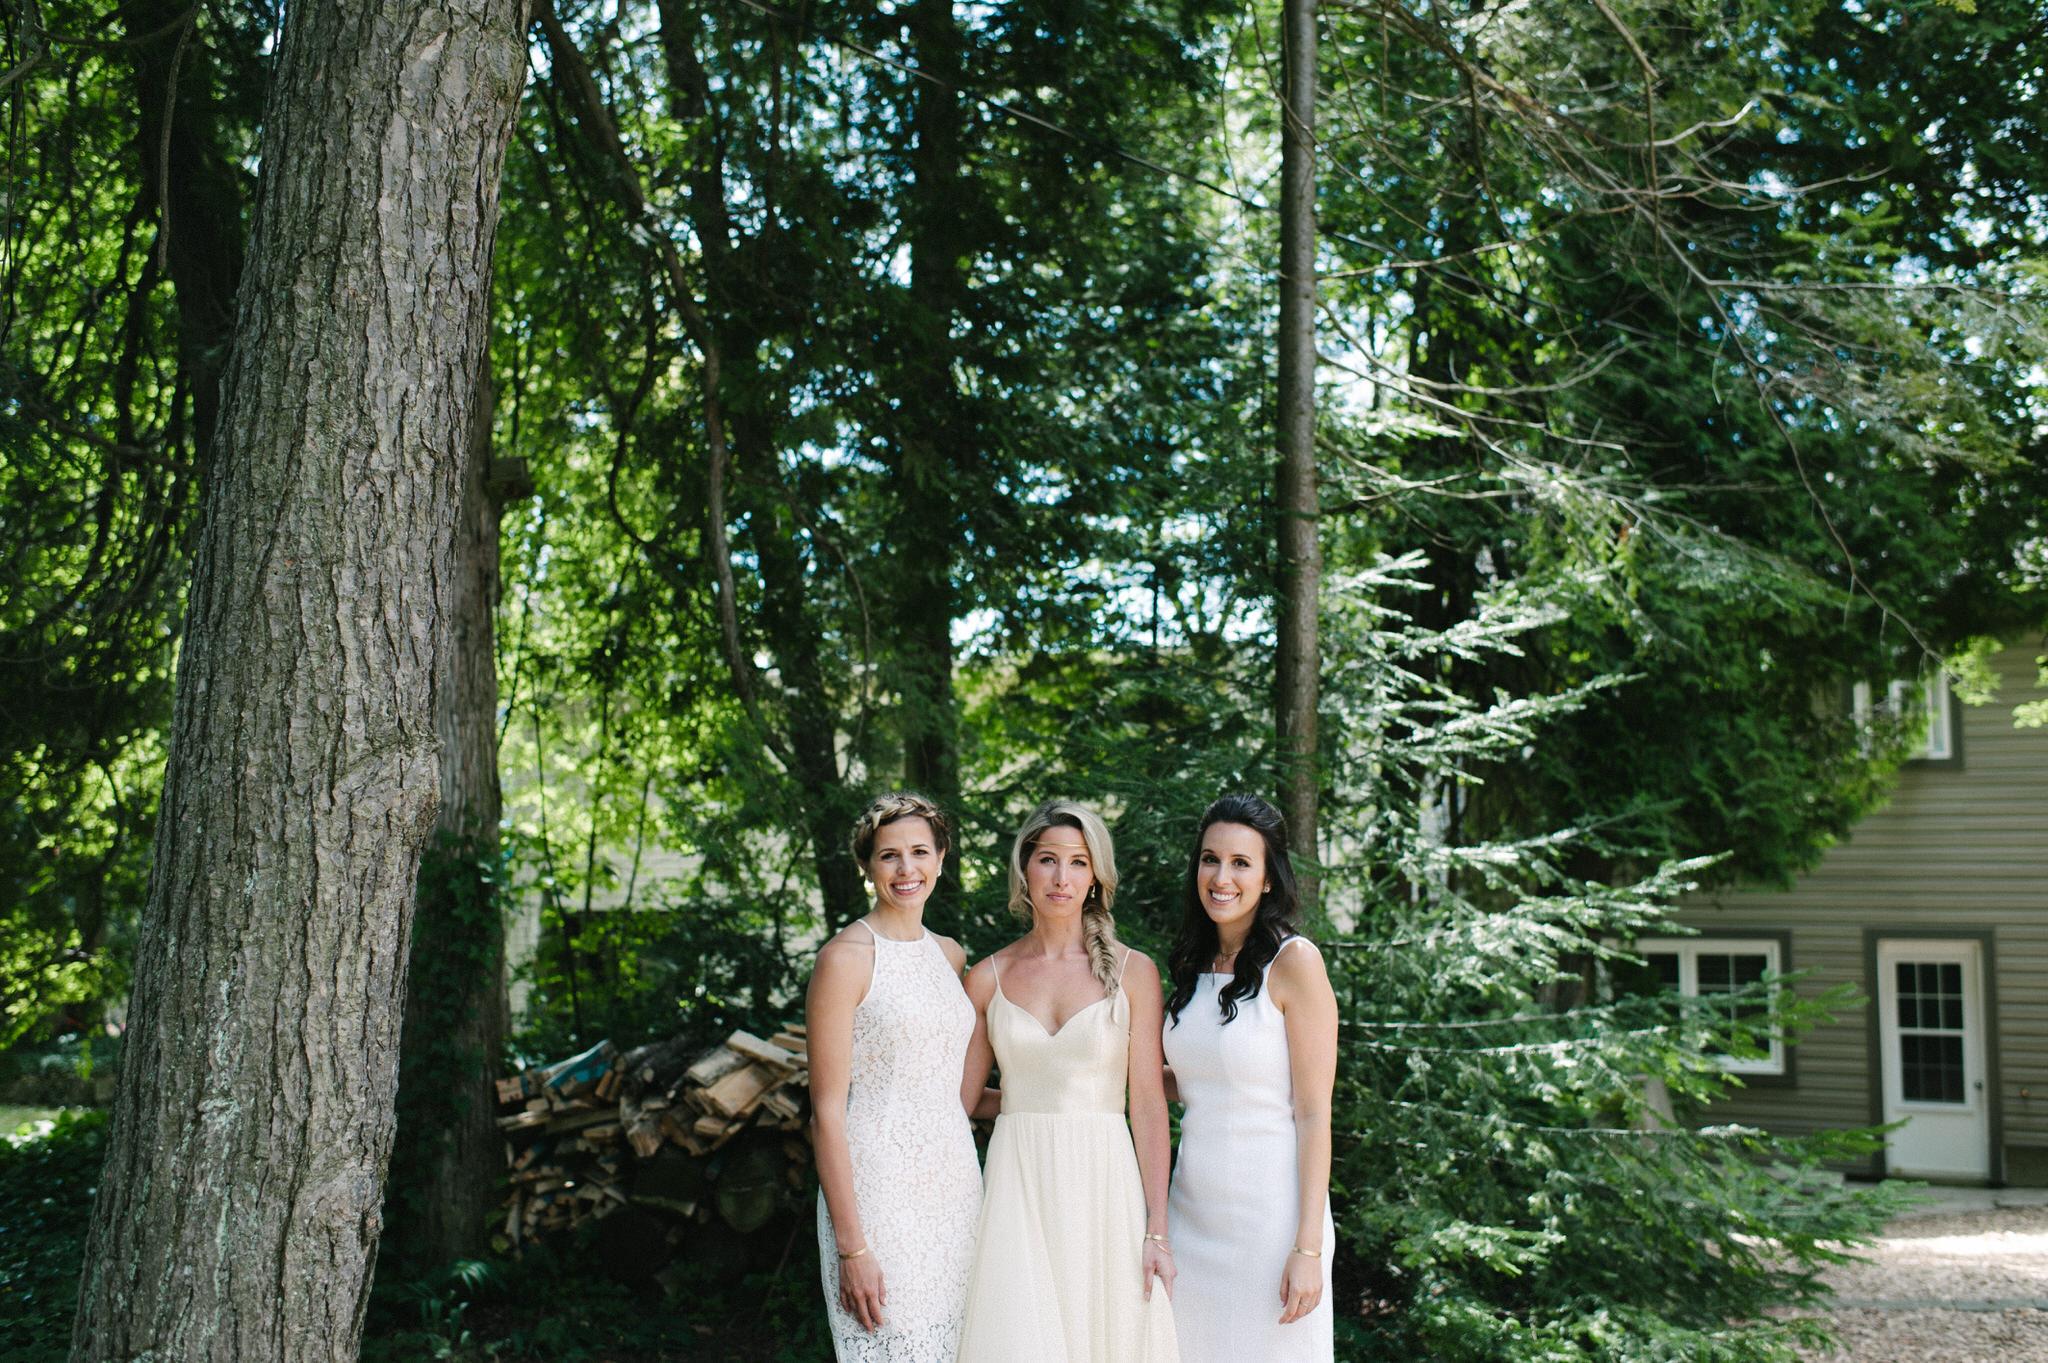 toronto wedding photography scarlet oneill053.JPG